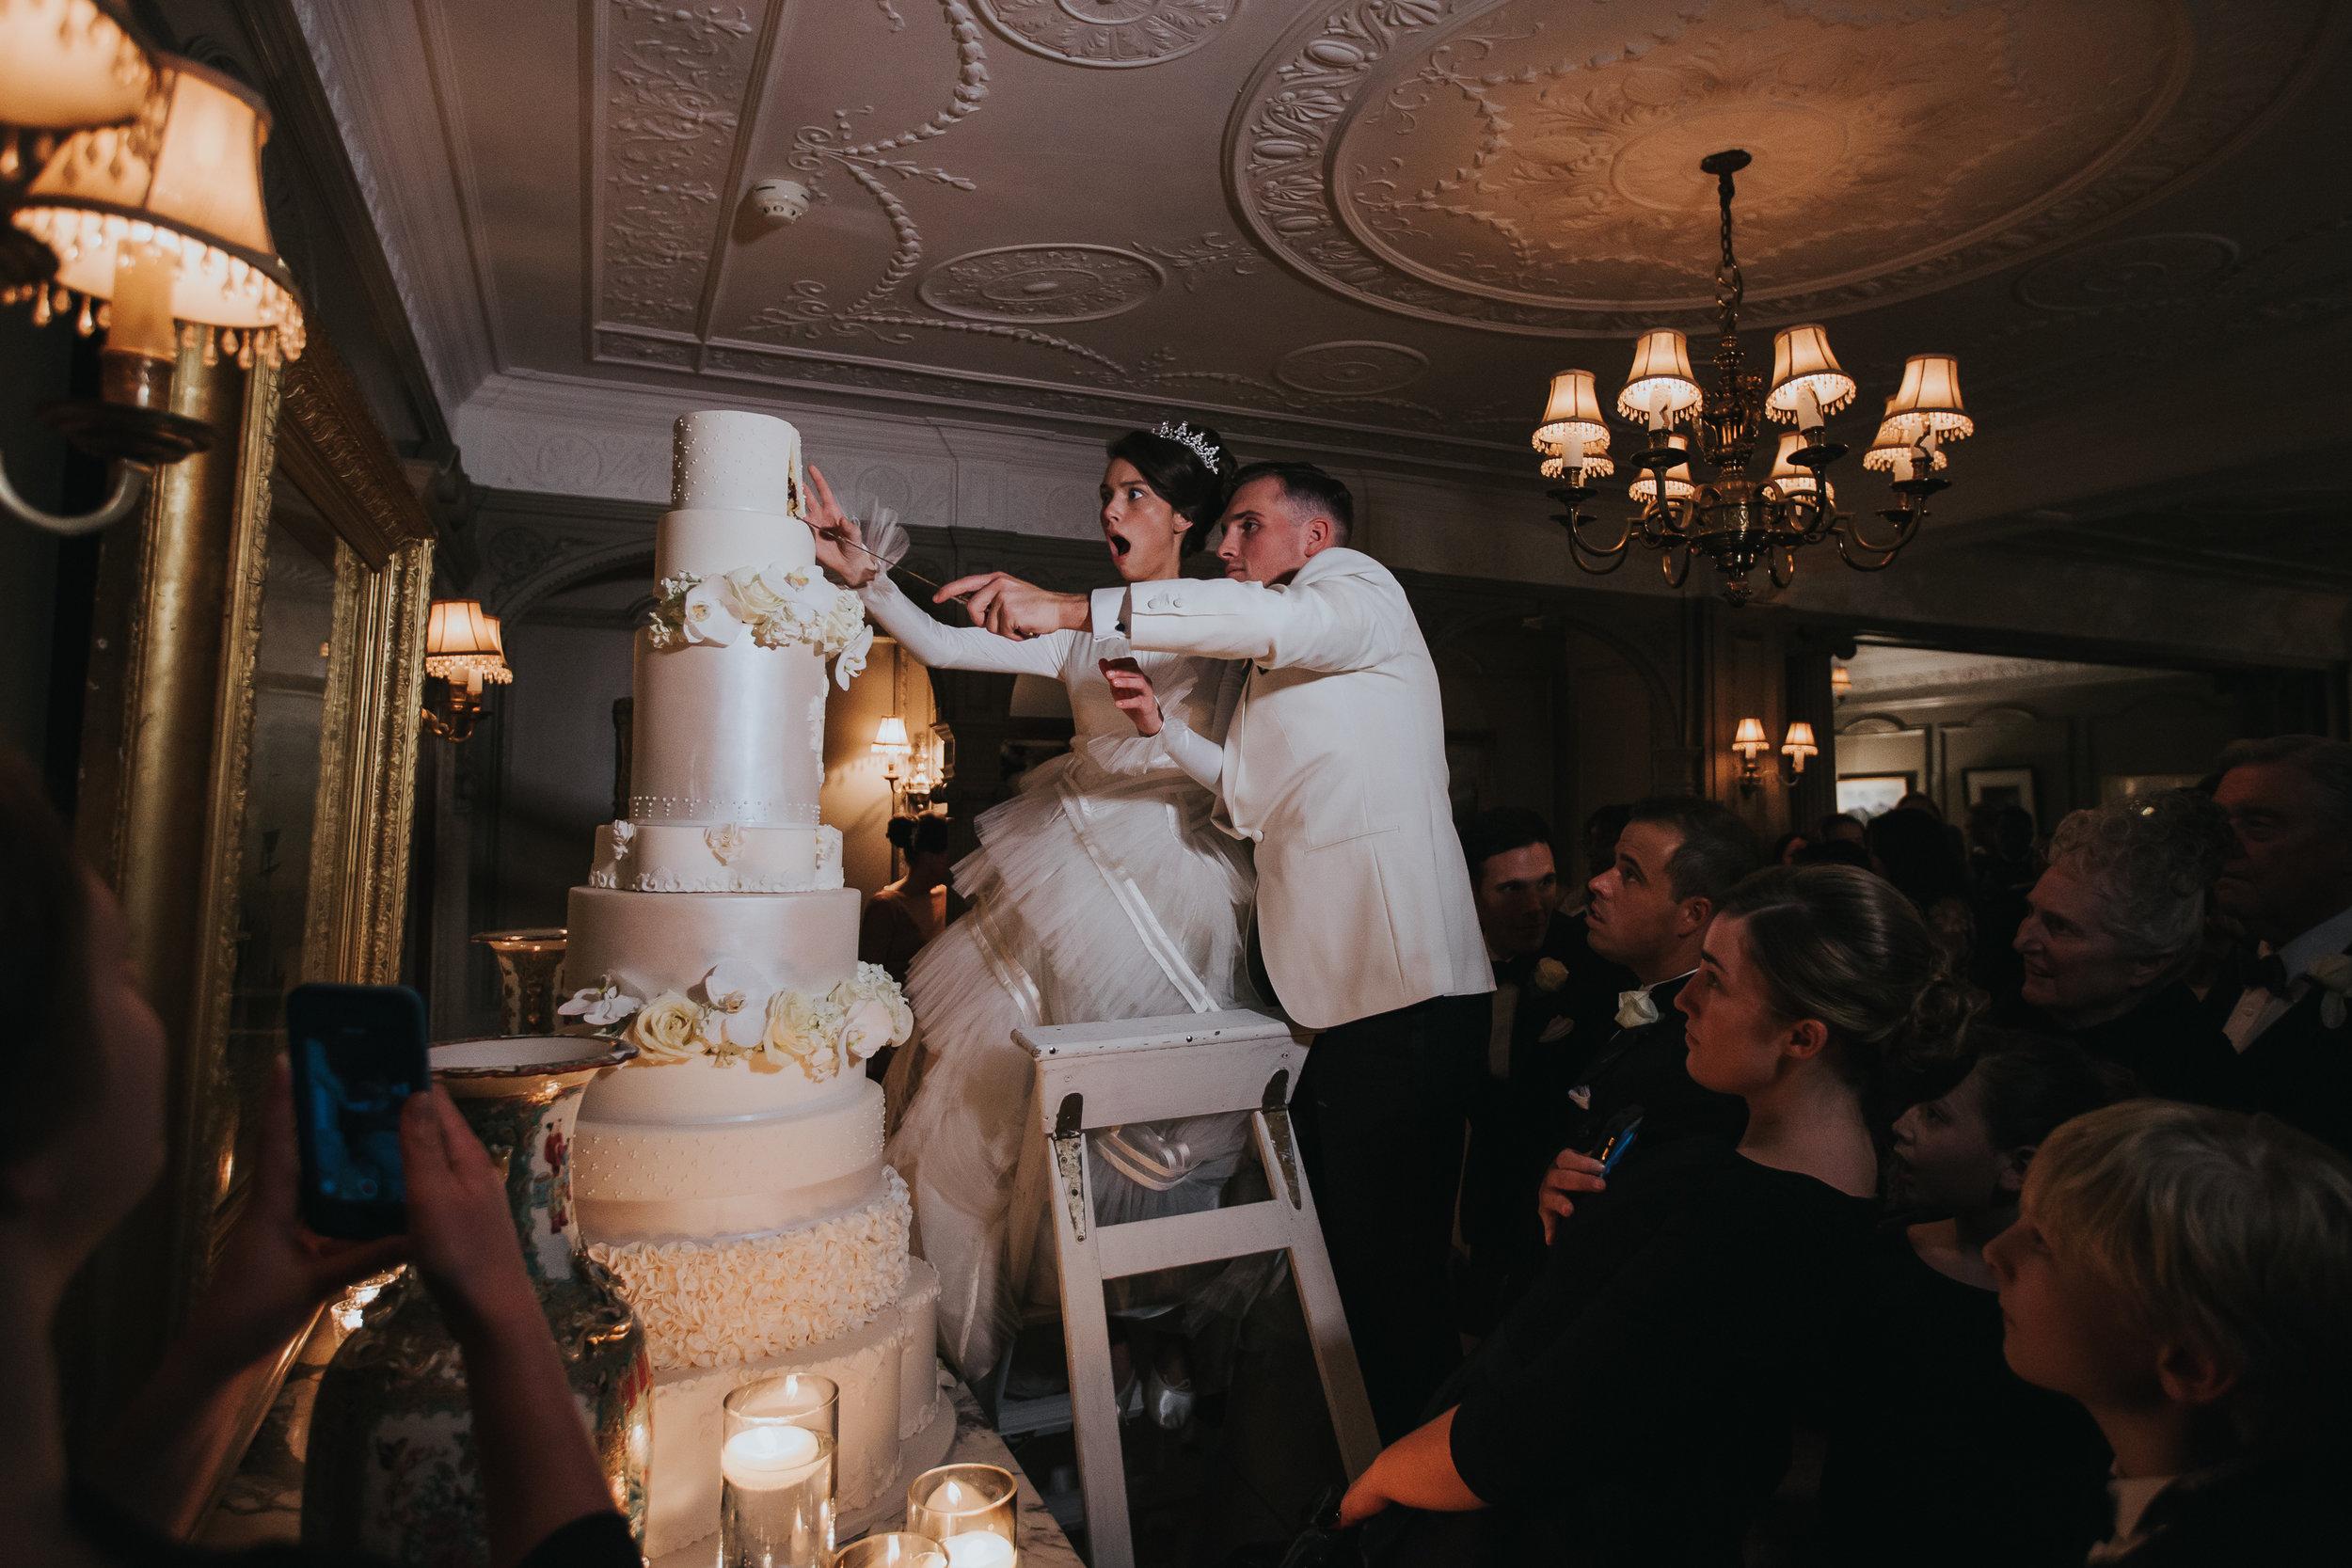 Little Button Bakery littlebuttonbakery.co.uk Jon Bird Weddings Haley and Boston Young 1.JPG